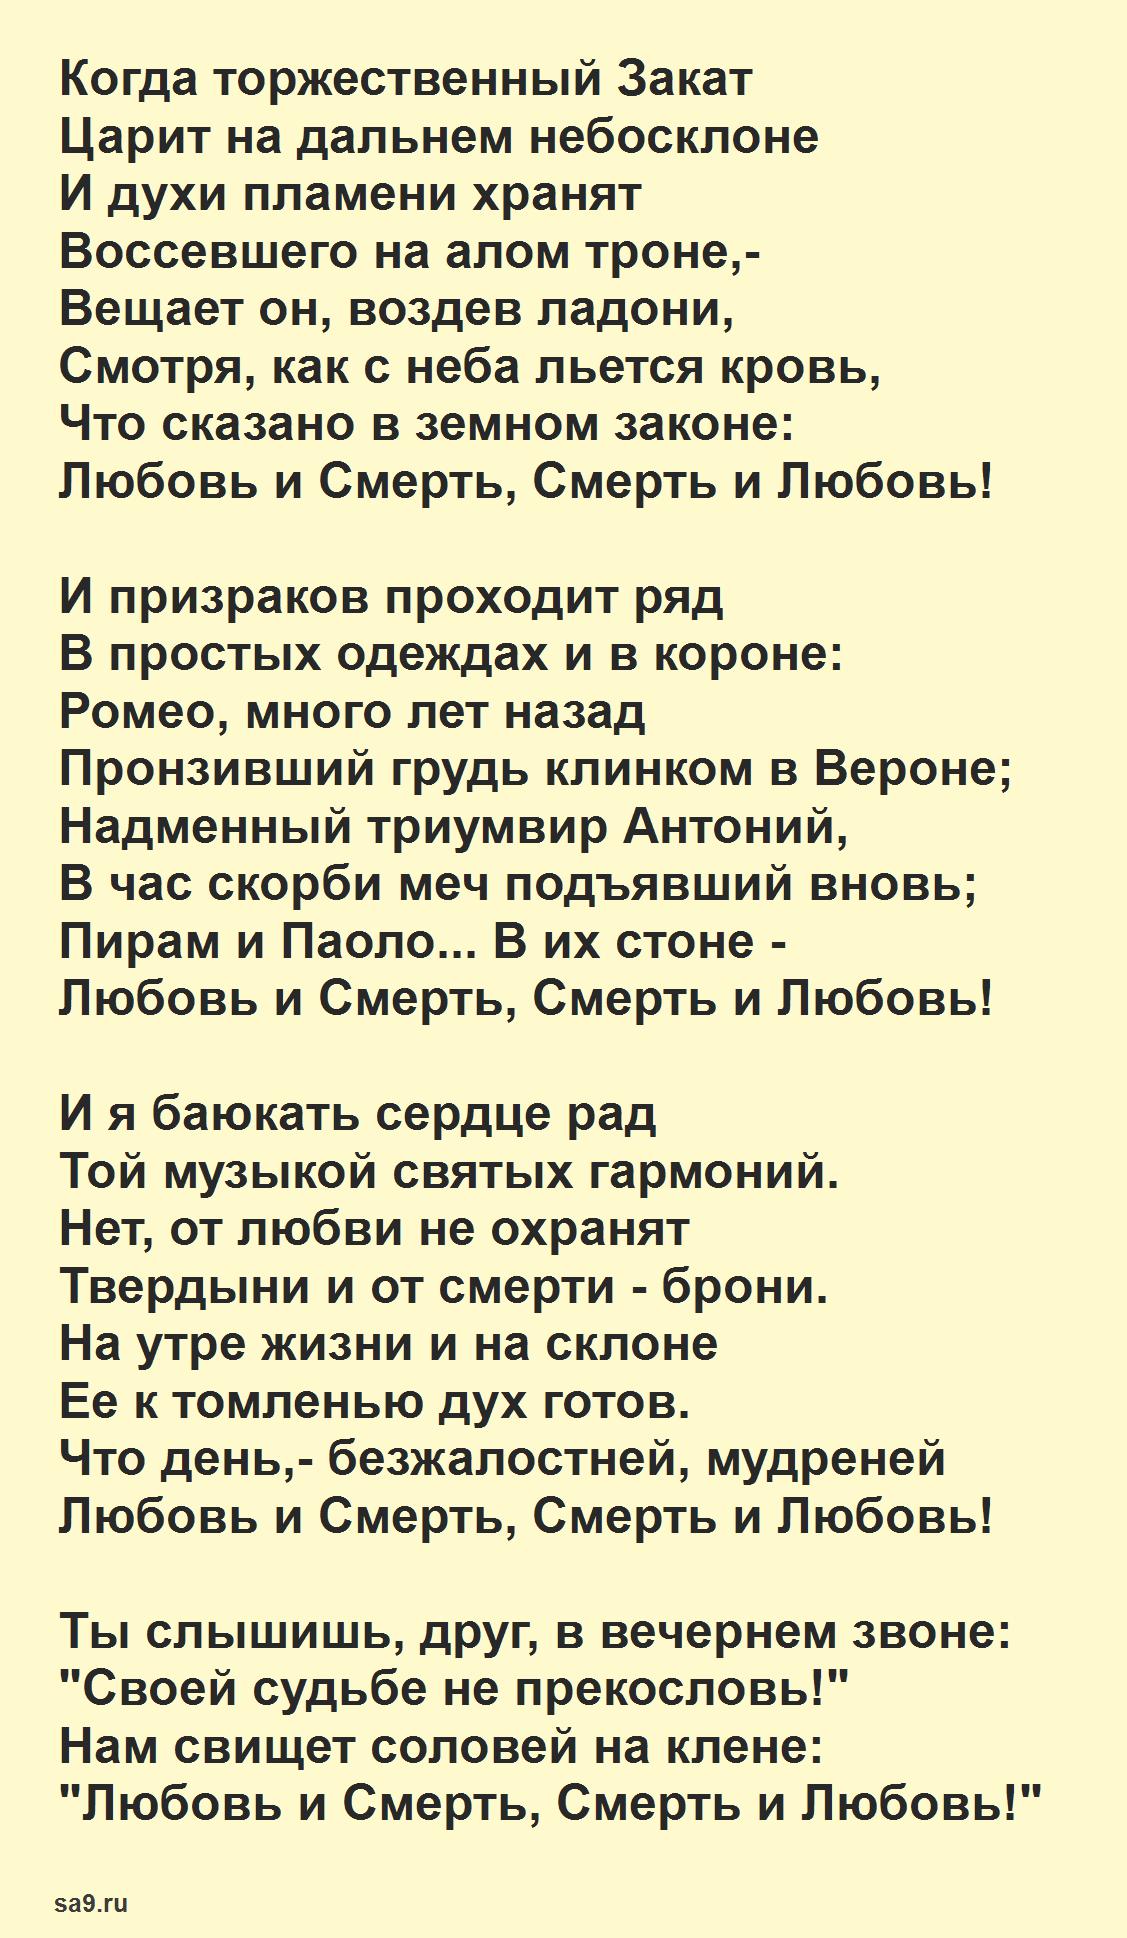 Стихи Брюсова - Баллада о любви и смерти